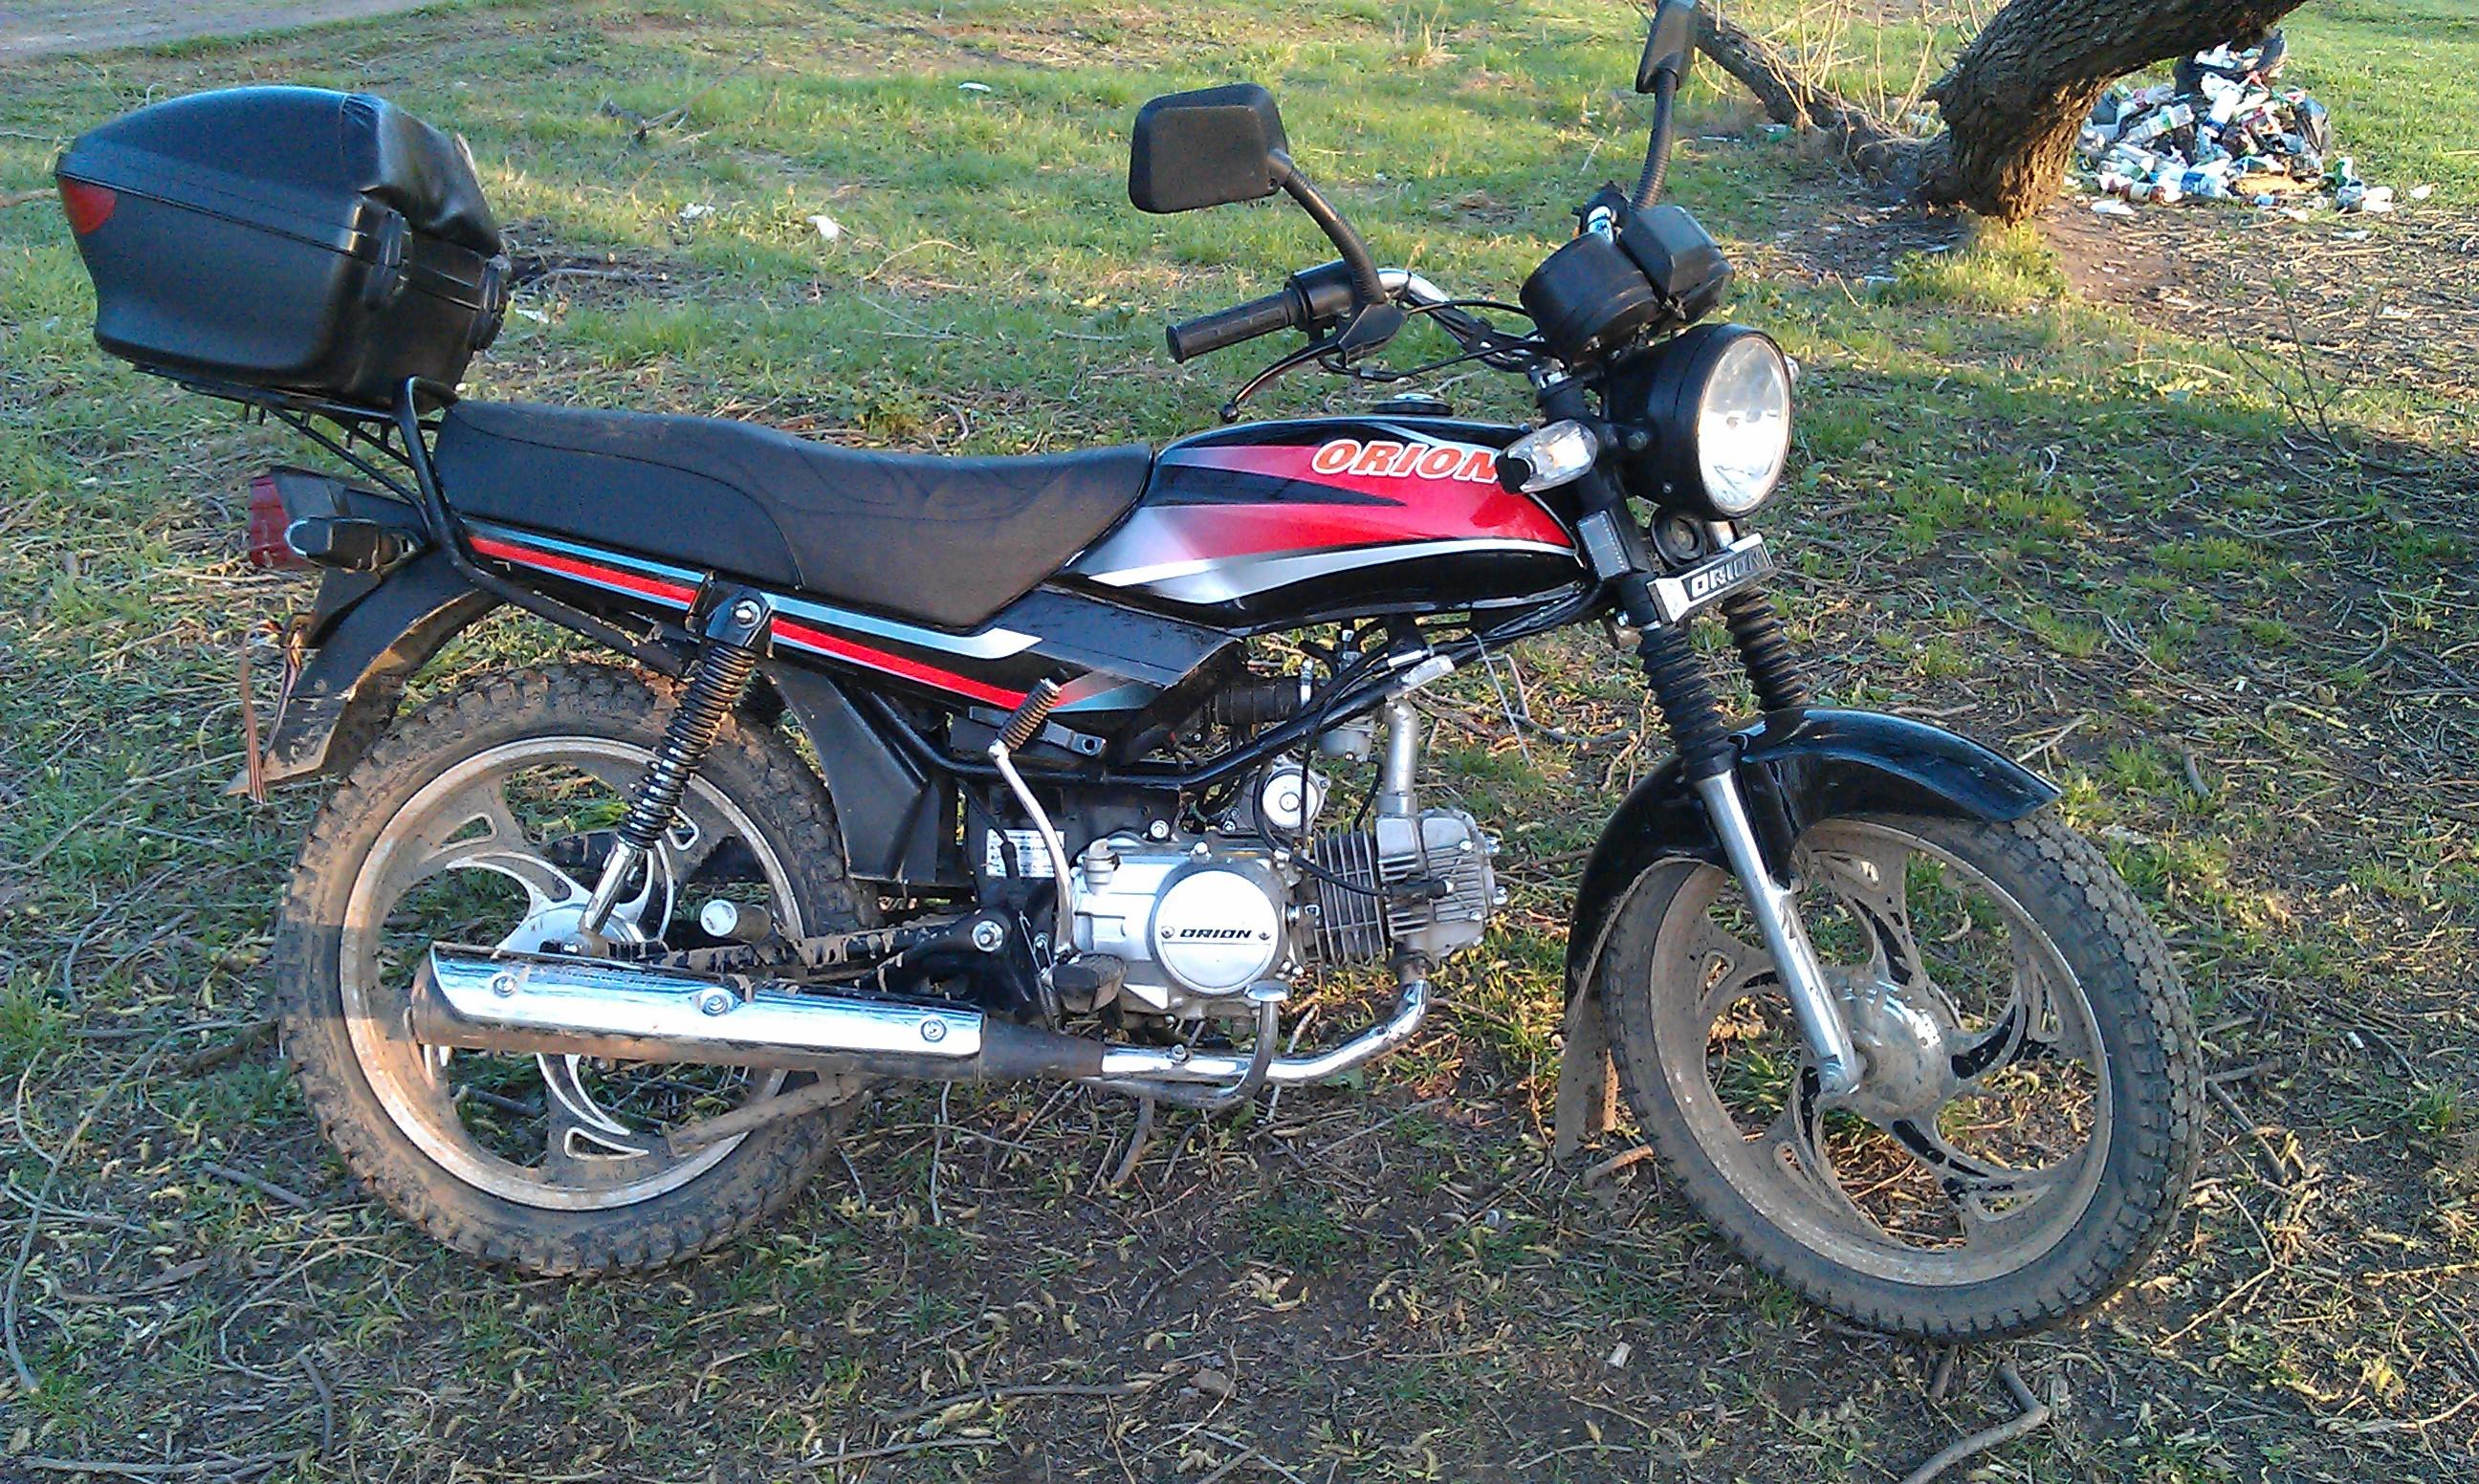 мотоцикл орион 125